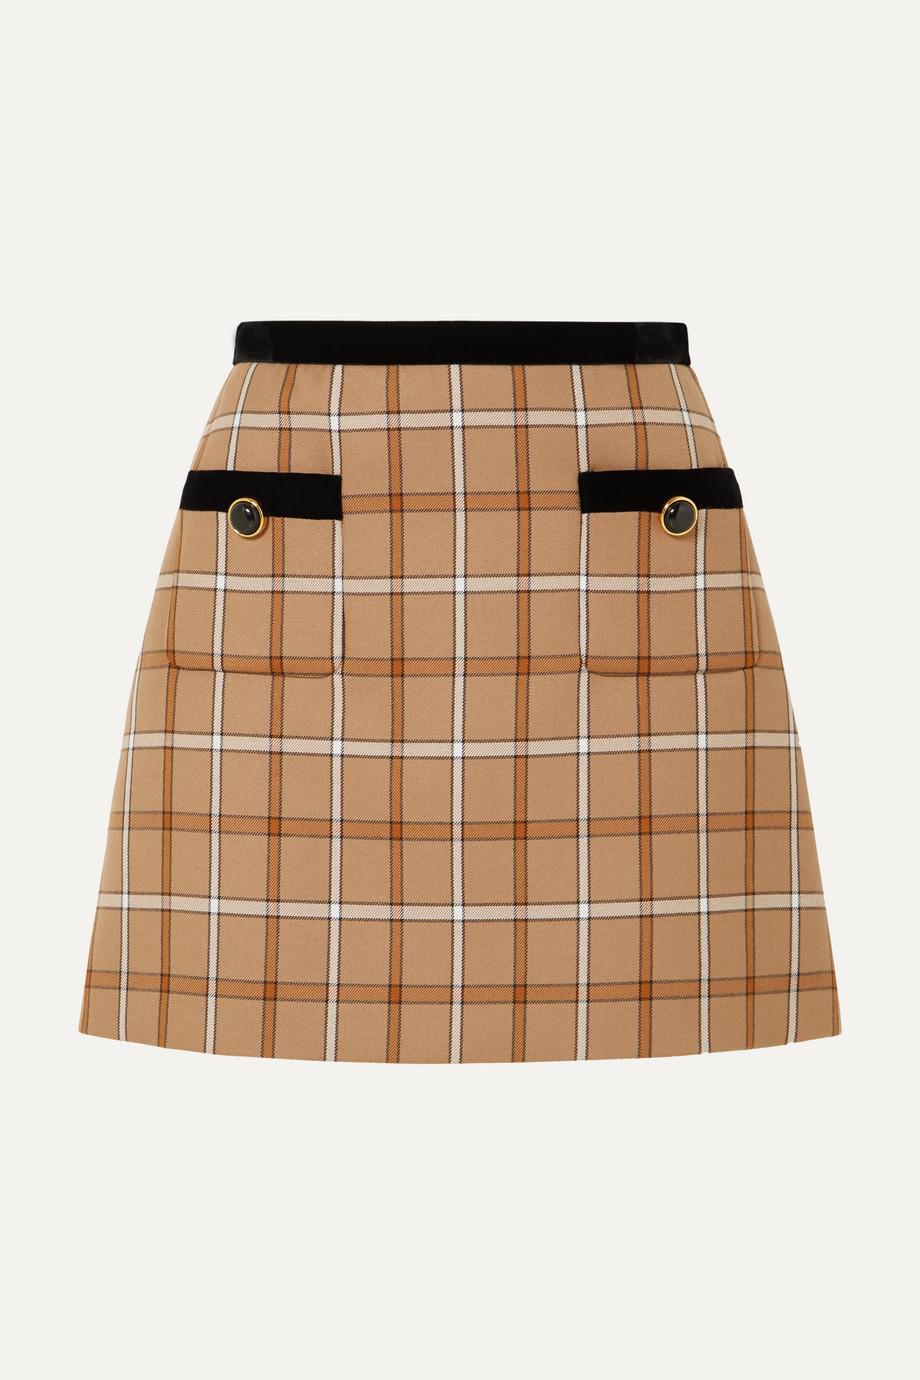 Miu Miu Velvet-trimmed checked woven mini skirt